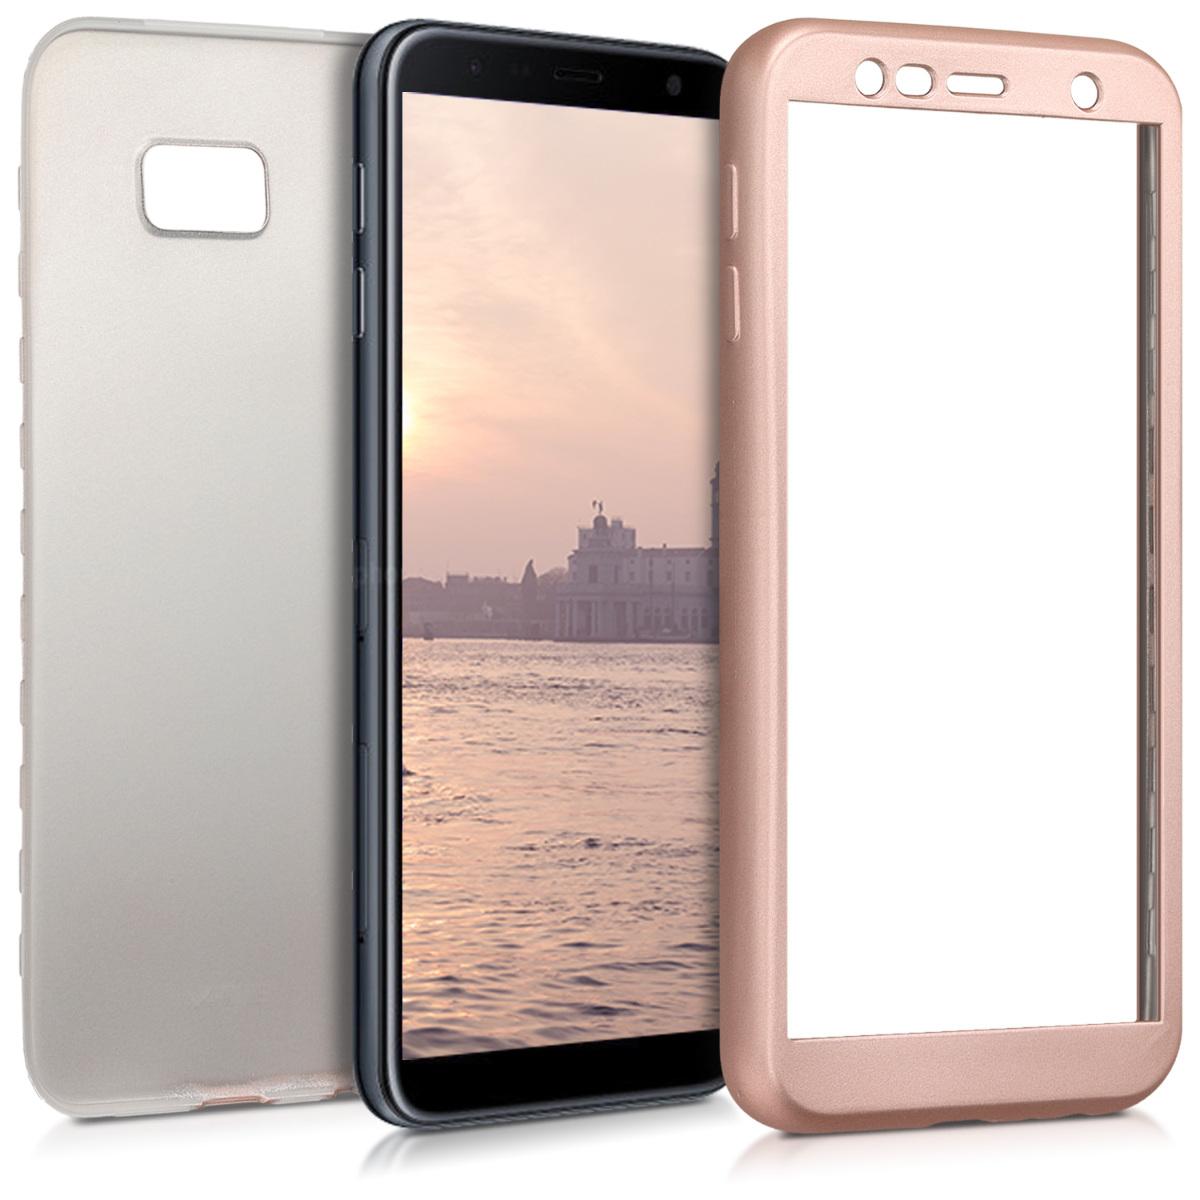 KW Θήκη Σιλικόνης Full Body Samsung Galaxy J4 Plus - Metallic Rose Gold - (46436.31)